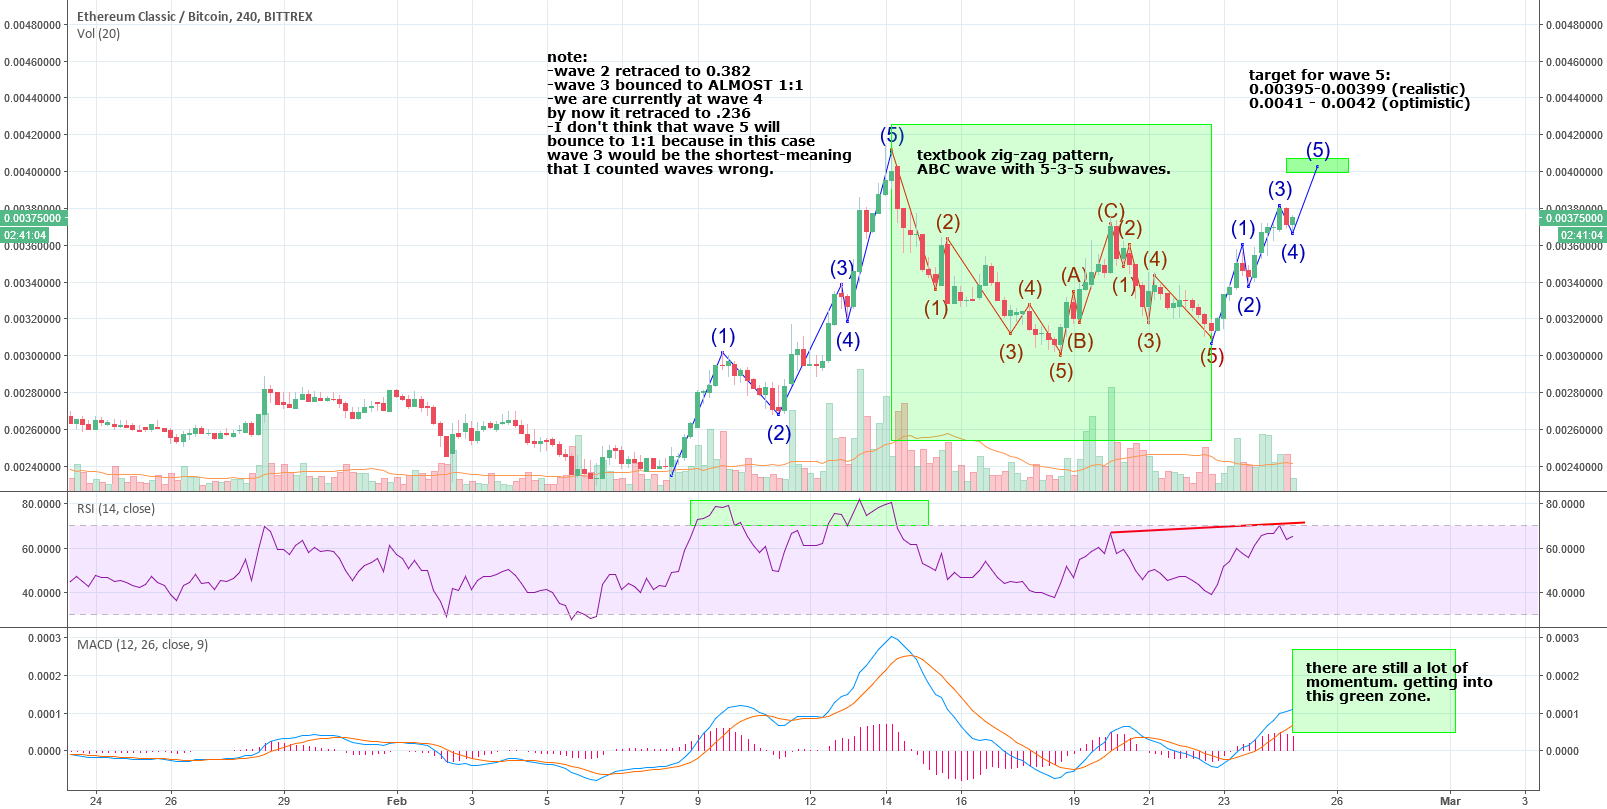 ETC - 4hr chart